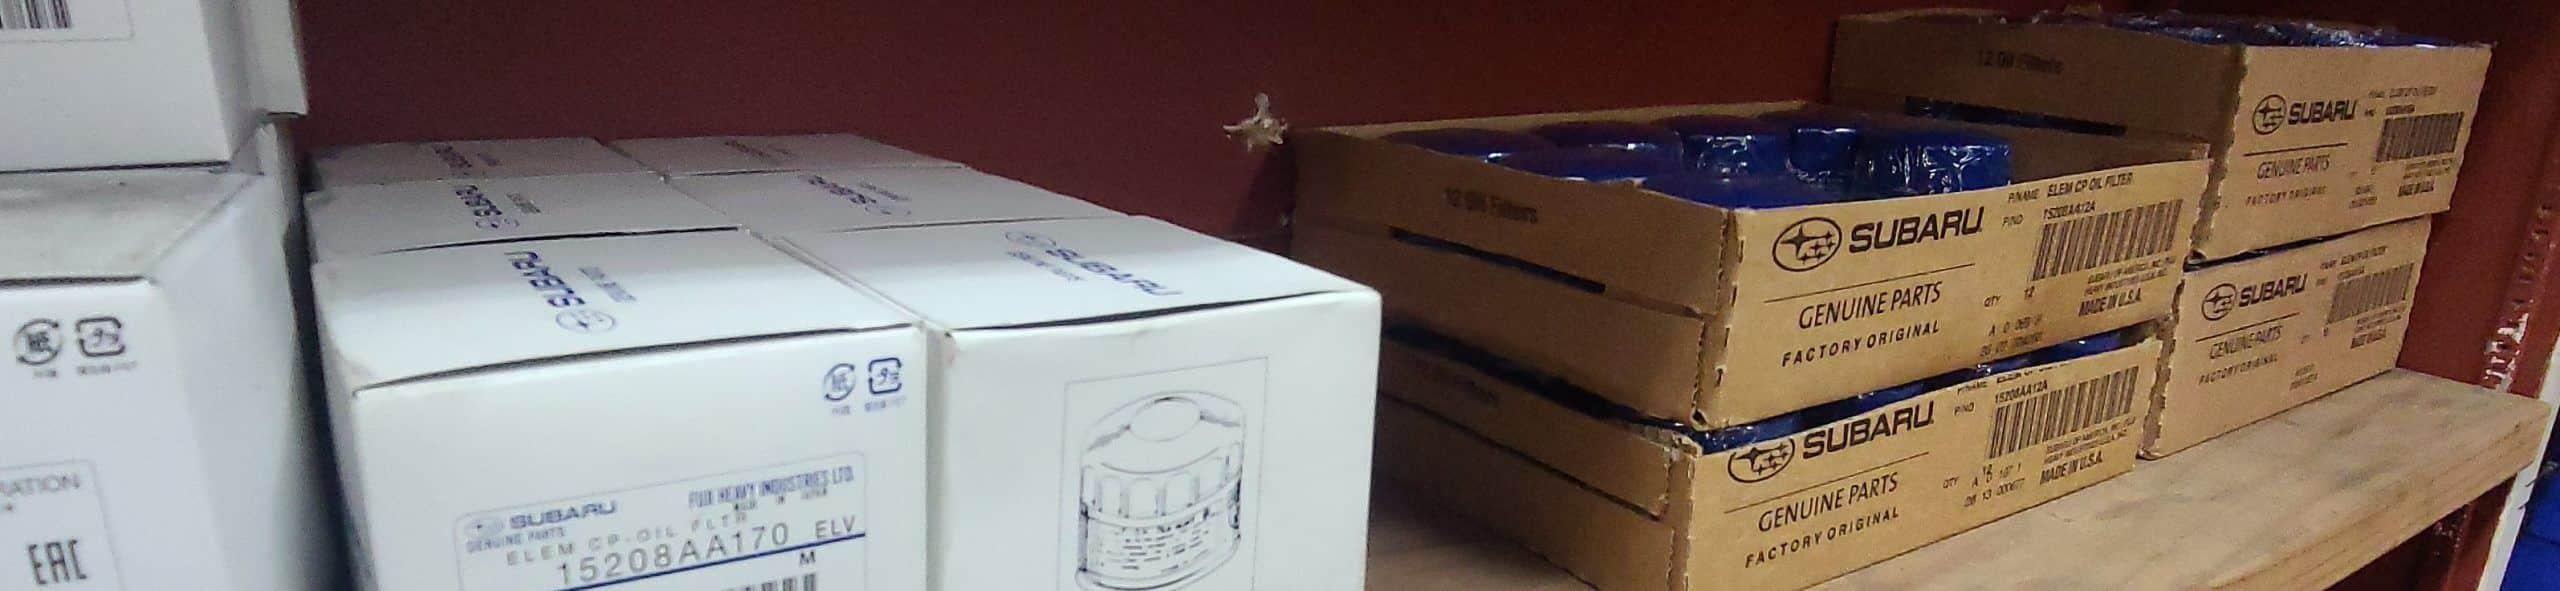 boxes of Subaru oil filters